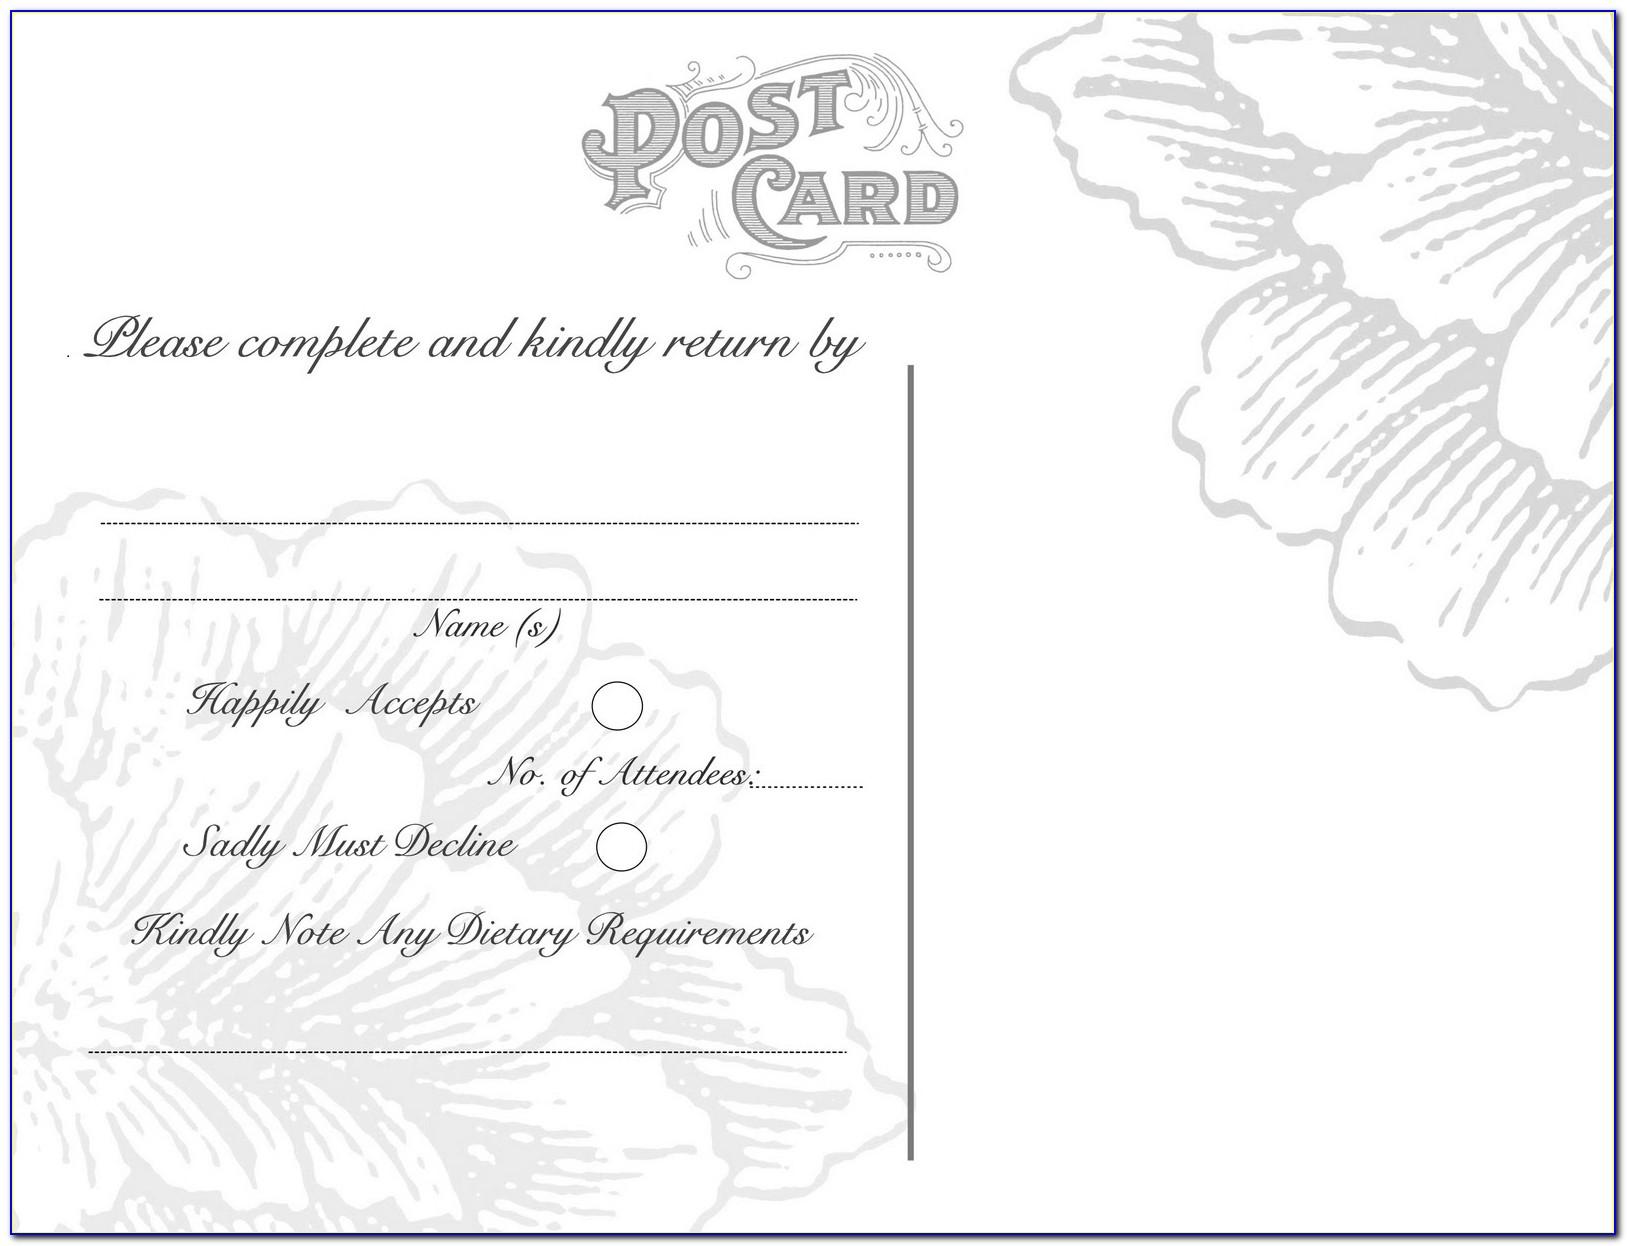 Postcard Rsvp Wedding Template Free